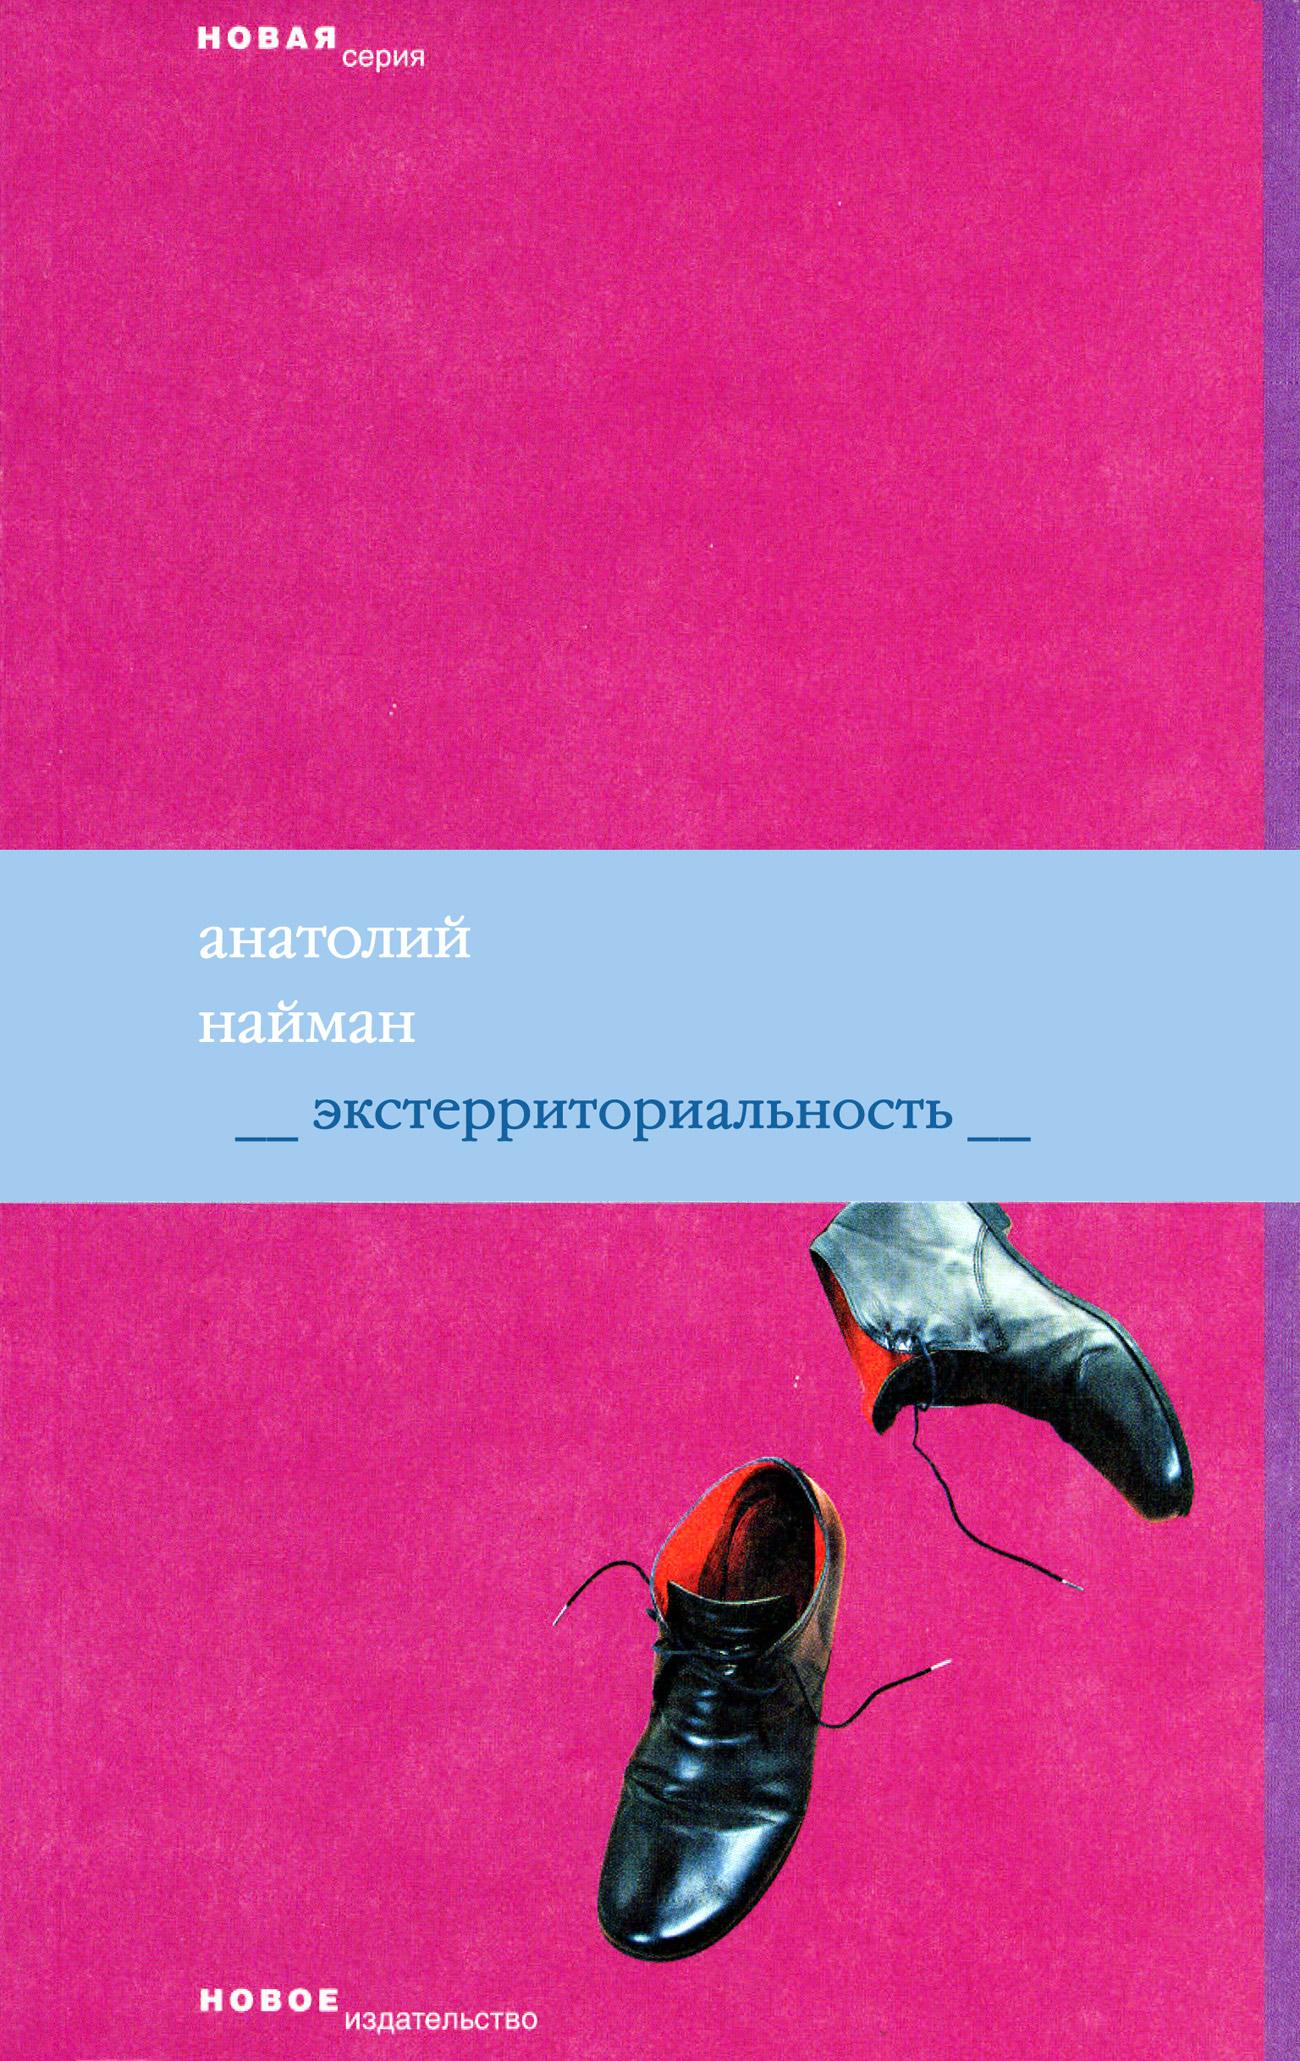 Анатолий Найман Экстерриториальность цена